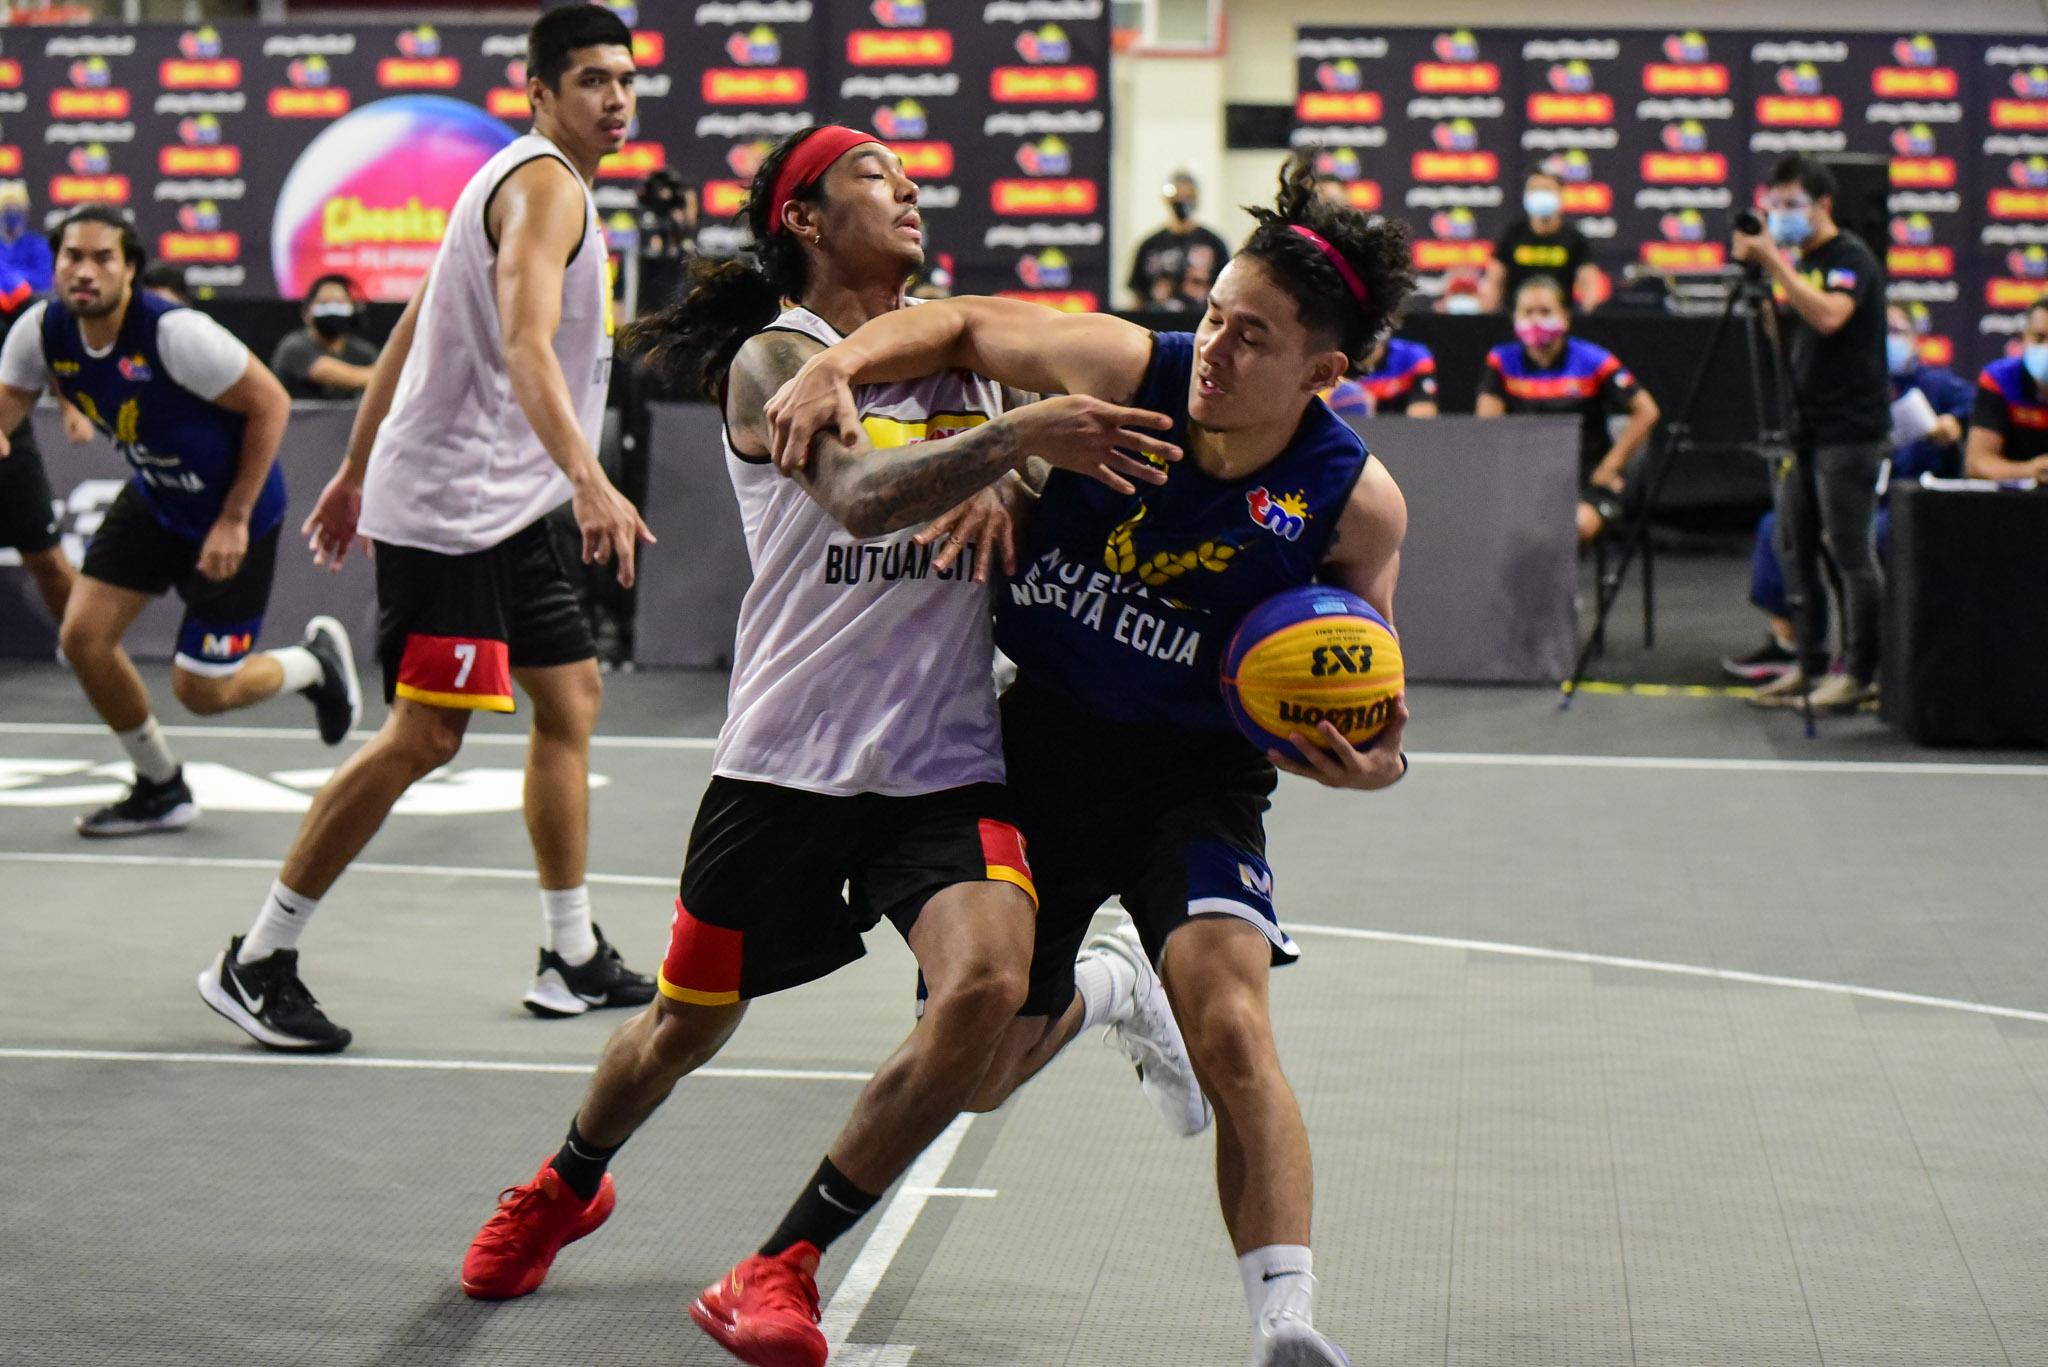 Chooks-to-Go-Pilipinas-3X3-Zamboanga-Chooks-vs-Butuan-Gomez-de-Liano Justine Baltazar in Pampanga Delta lineup Basketball DLSU NBL News UAAP  - philippine sports news